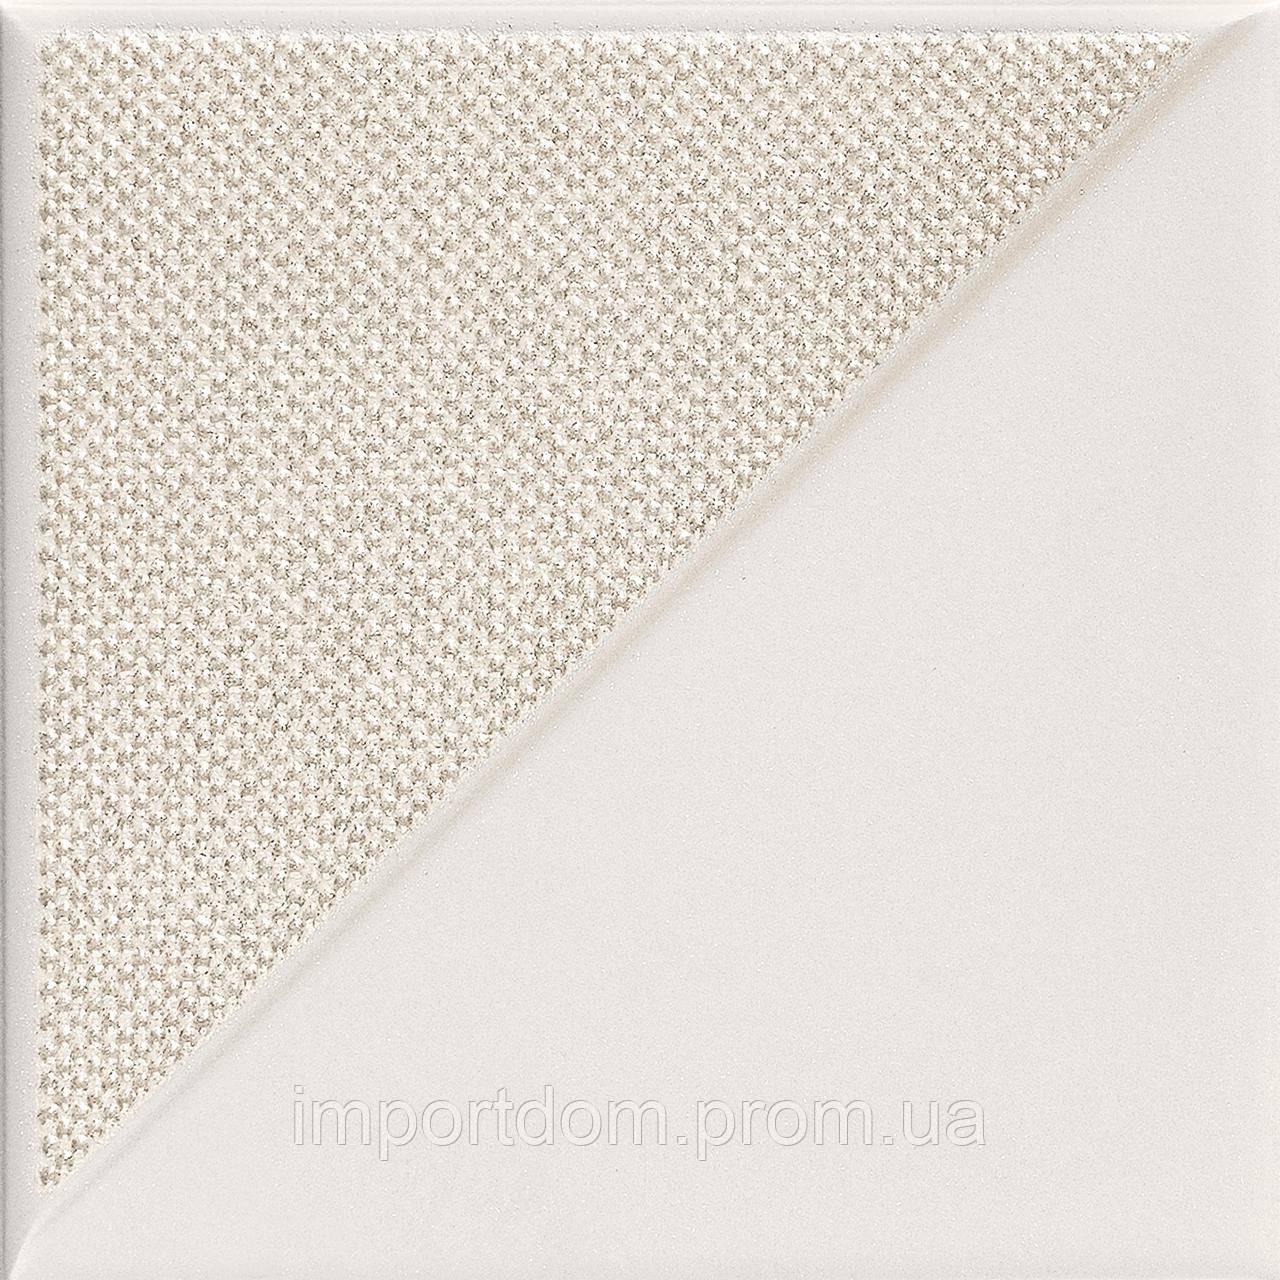 Плитка для пола и стен декор Tubadzin Reflection White 2 148х148х12.8